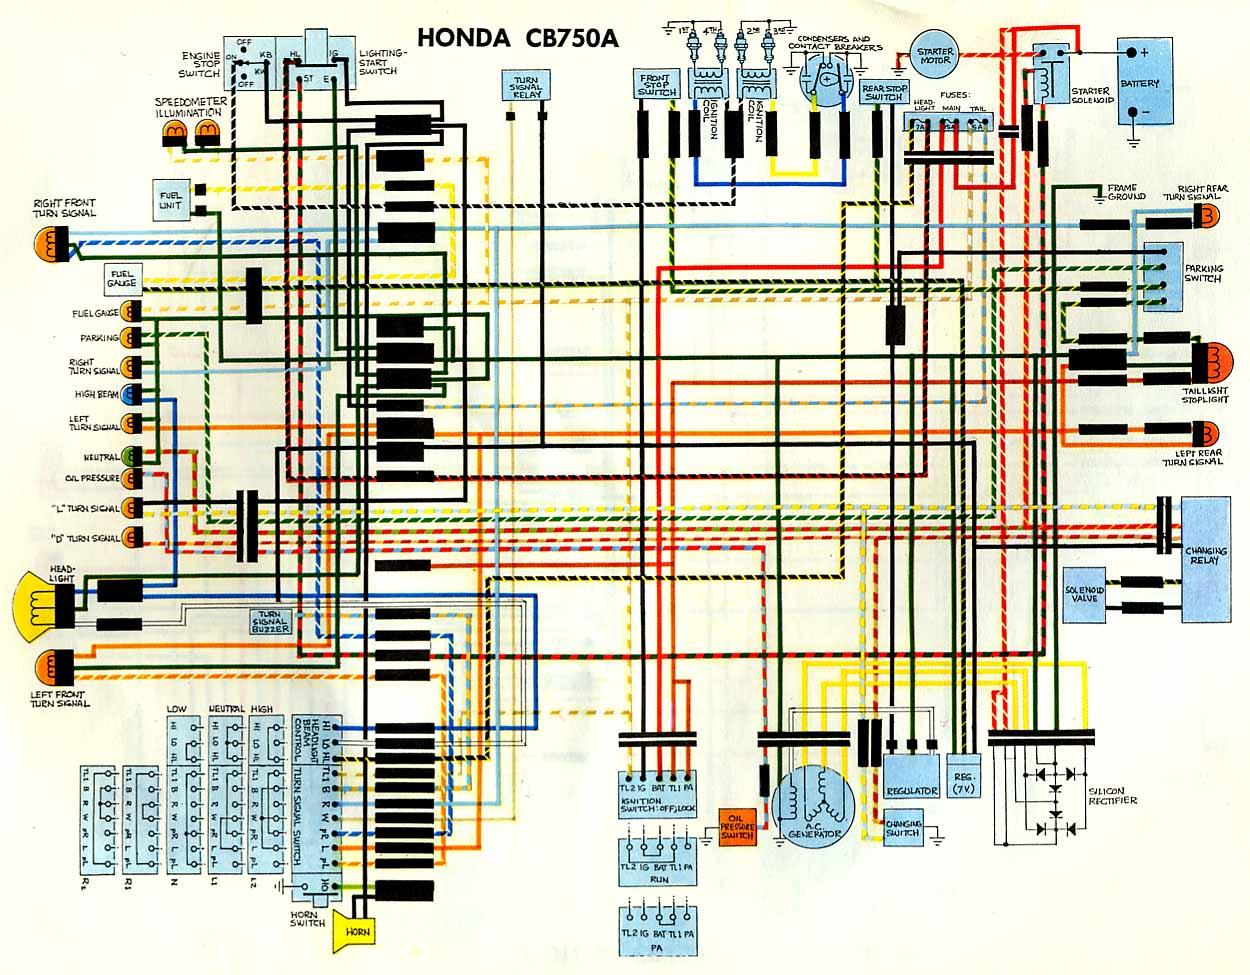 2005 Polaris Sportsman 400 Wiring Diagram 2005 Automotive Wiring – Polaris Sportsman 400 Wiring Diagram